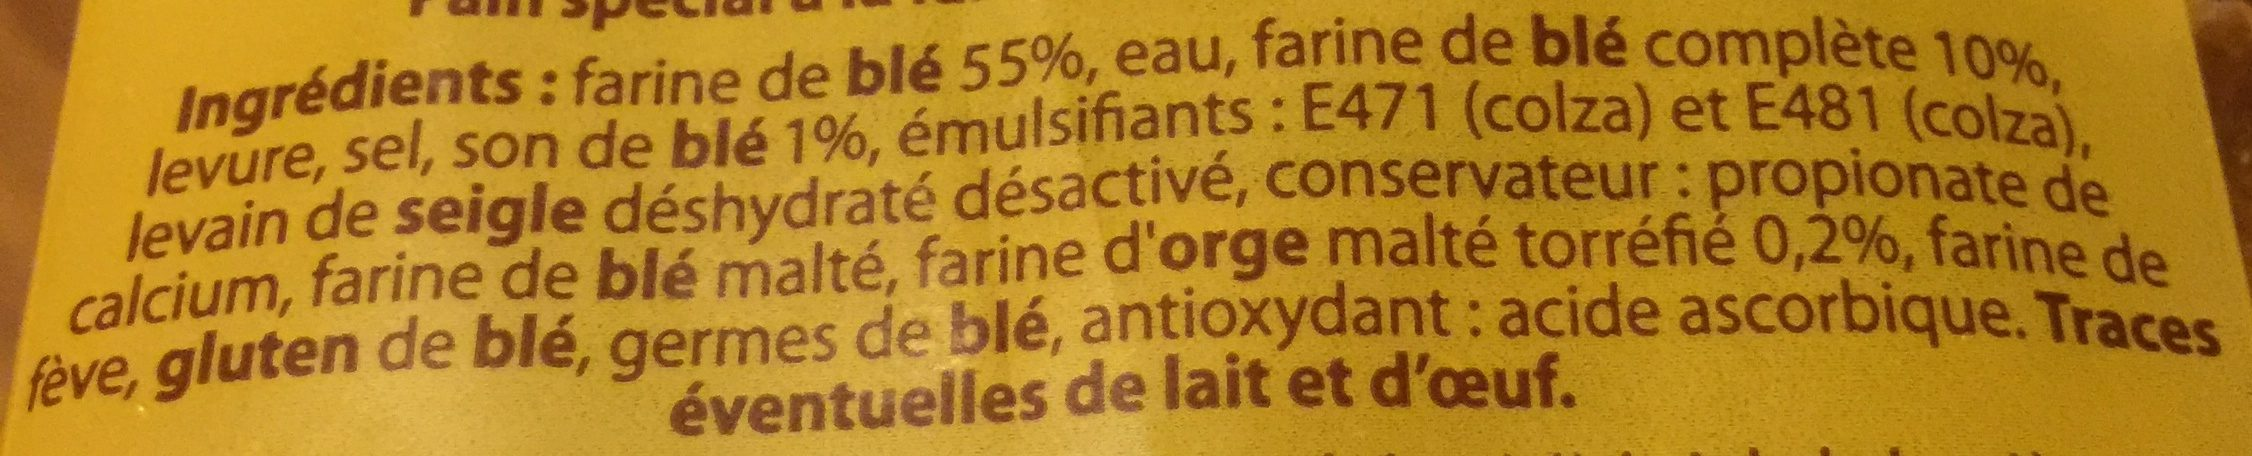 Pain Spécial Multicéréales - Ingrediënten - fr